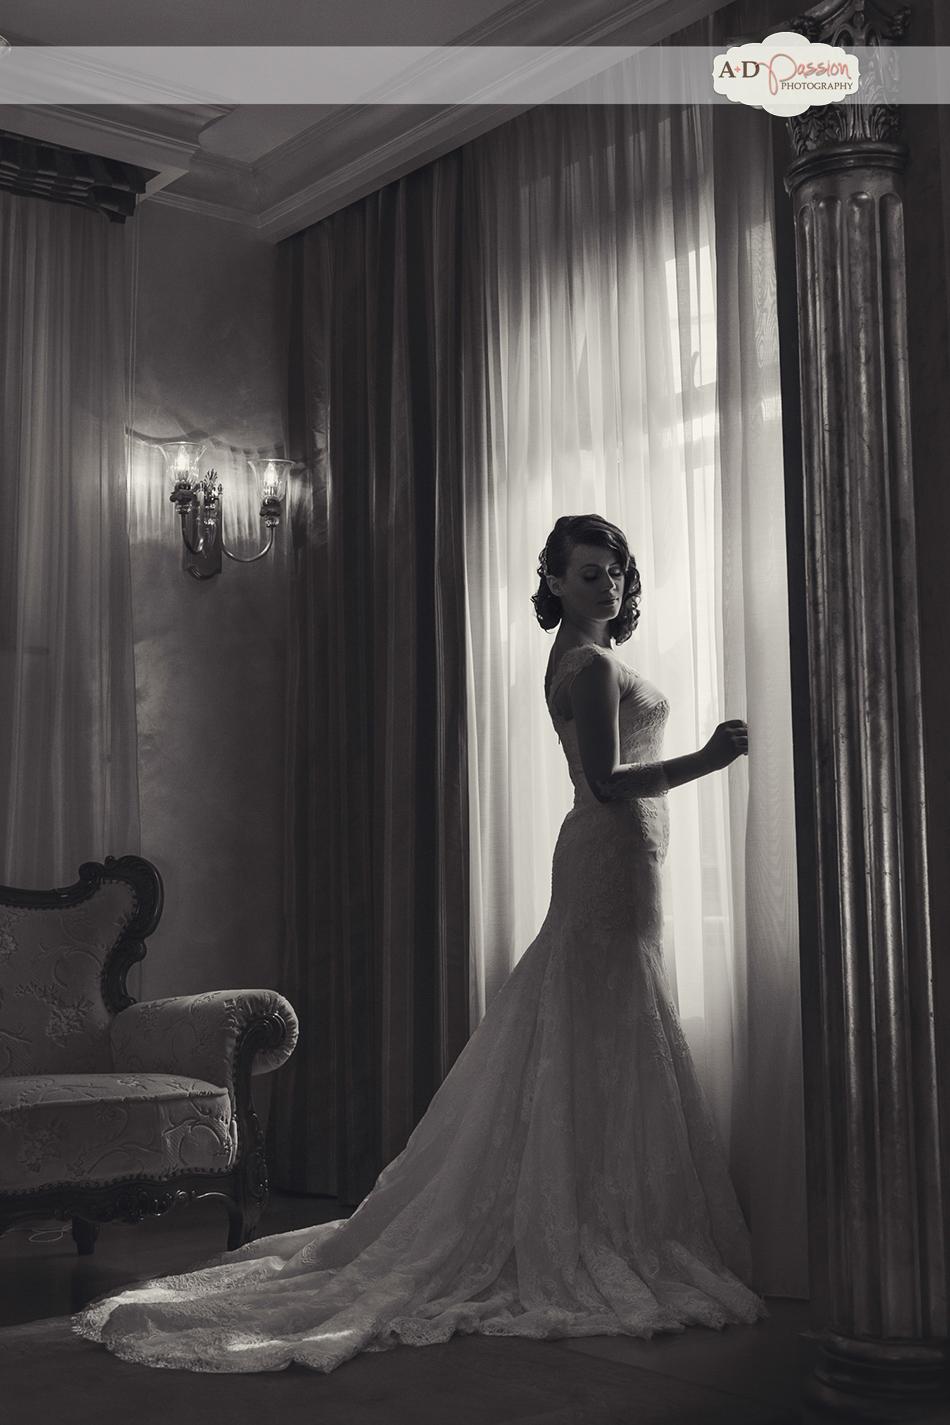 AD Passion Photography | 20130825_fotograf-nunta-vintage_octavian-simina_0042 | Adelin, Dida, fotograf profesionist, fotograf de nunta, fotografie de nunta, fotograf Timisoara, fotograf Craiova, fotograf Bucuresti, fotograf Arad, nunta Timisoara, nunta Arad, nunta Bucuresti, nunta Craiova